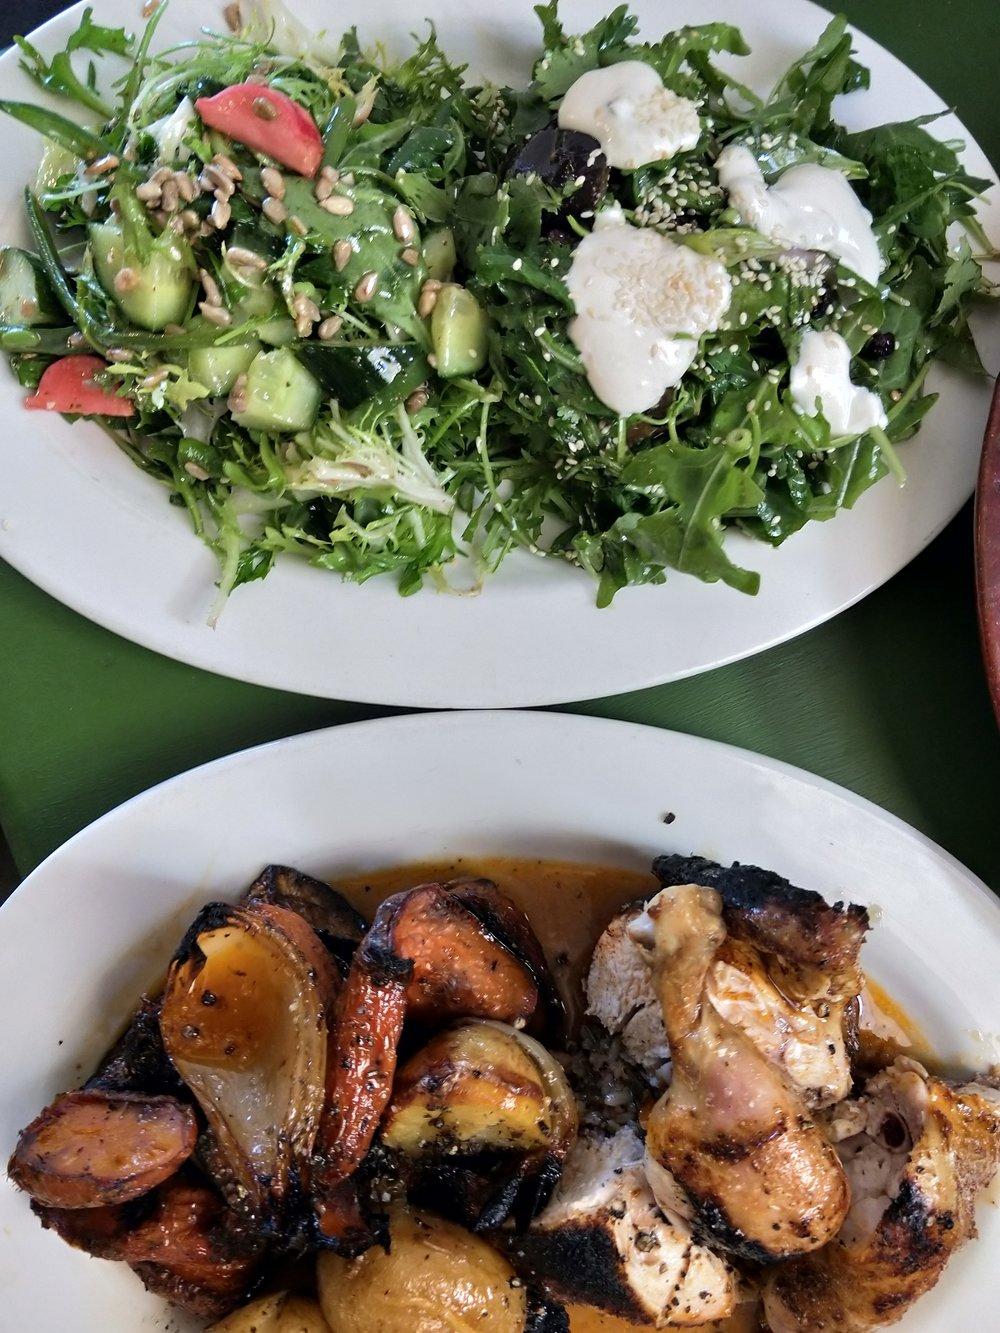 Rocket, Green Bean & Pickle Salad w/ Eggplant Salad, Roast Vegetables and Chicken